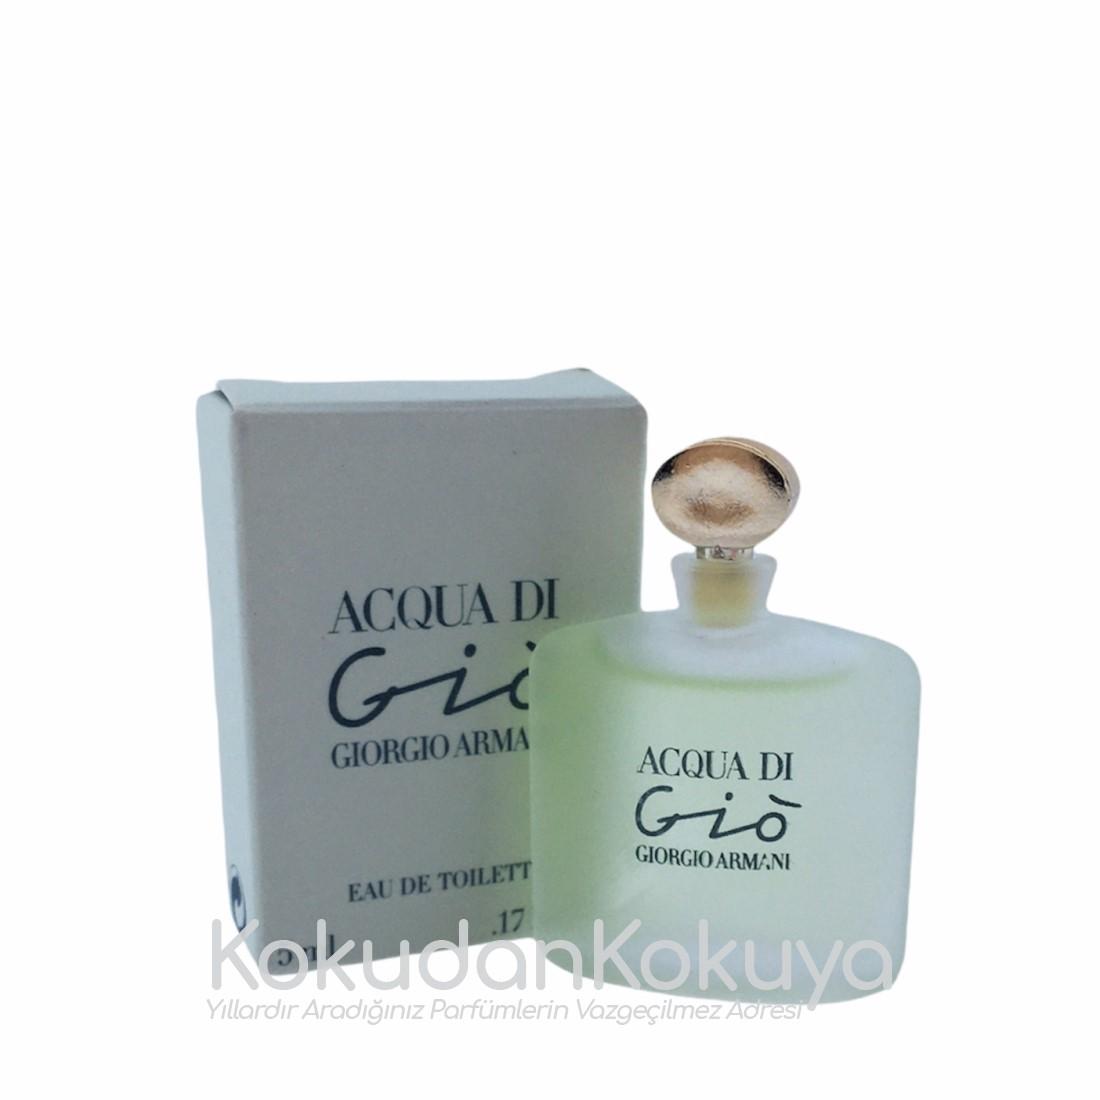 GIORGIO ARMANI Acqua Di Gio pour Femme (Vintage) Parfüm Kadın 5ml Eau De Toilette (EDT) Dökme